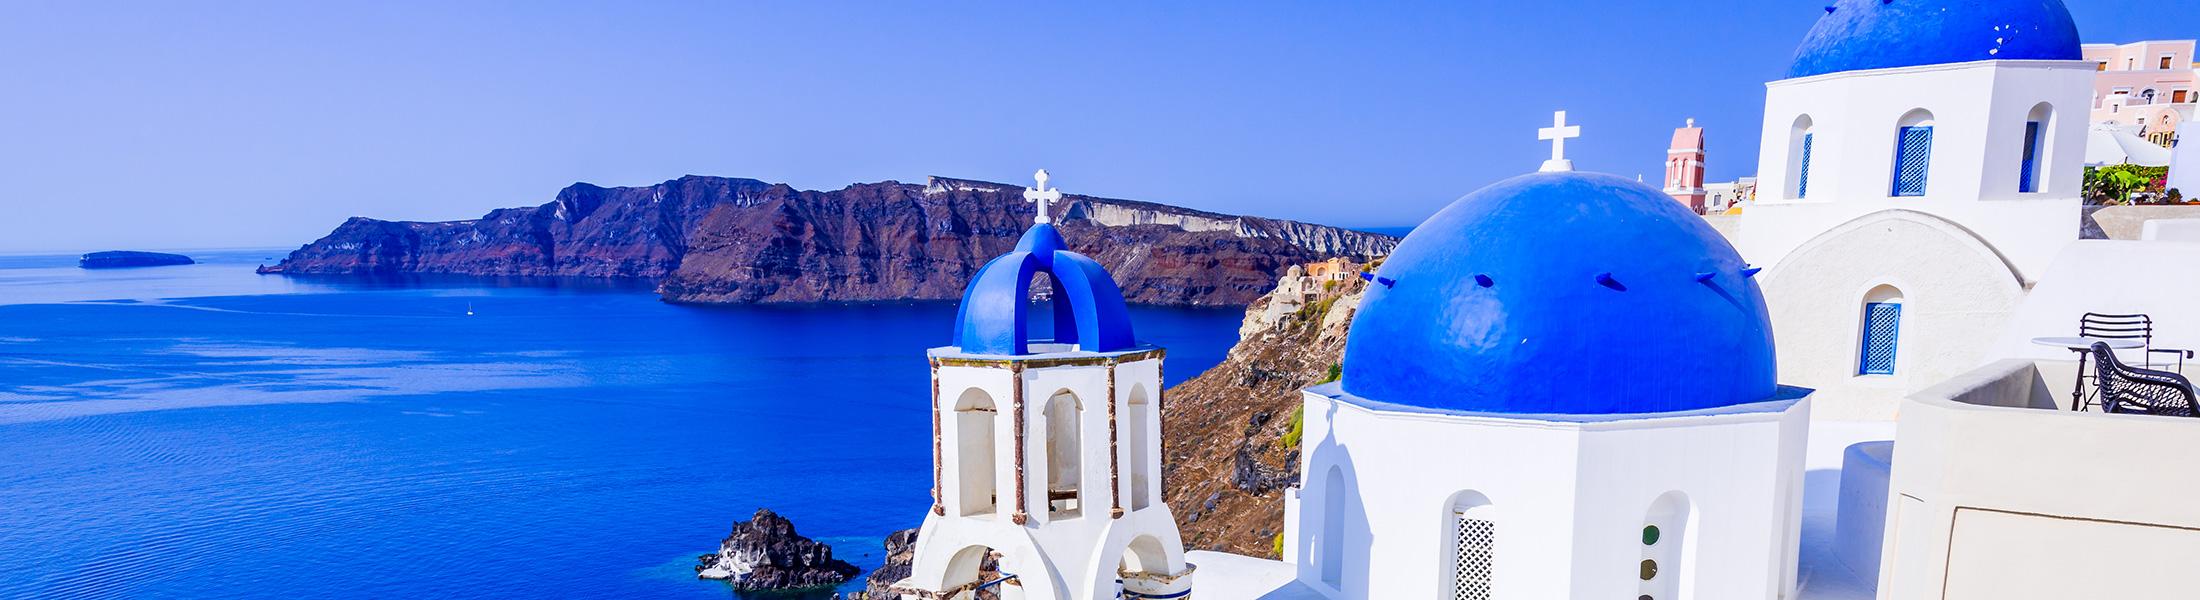 Rooftops and caldera in Santorini Greece in Europe